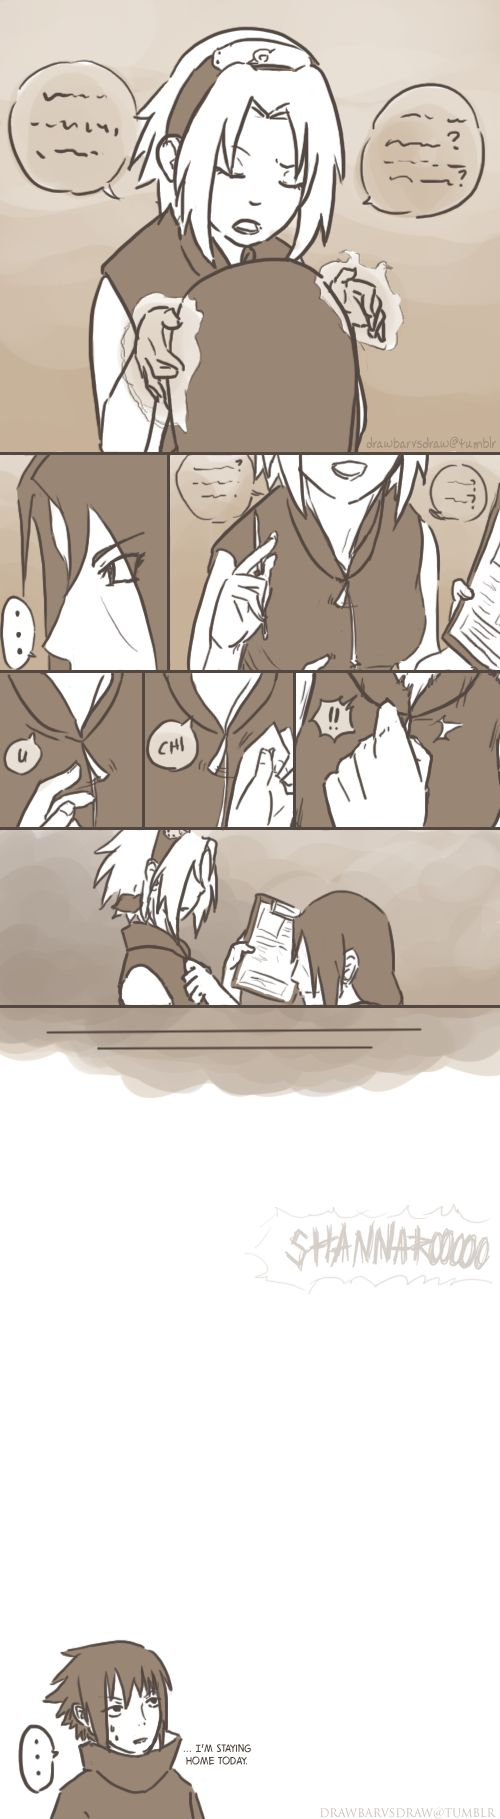 Please Concentrate, Itachi-san by pyxislynx.deviantart.com on @deviantART